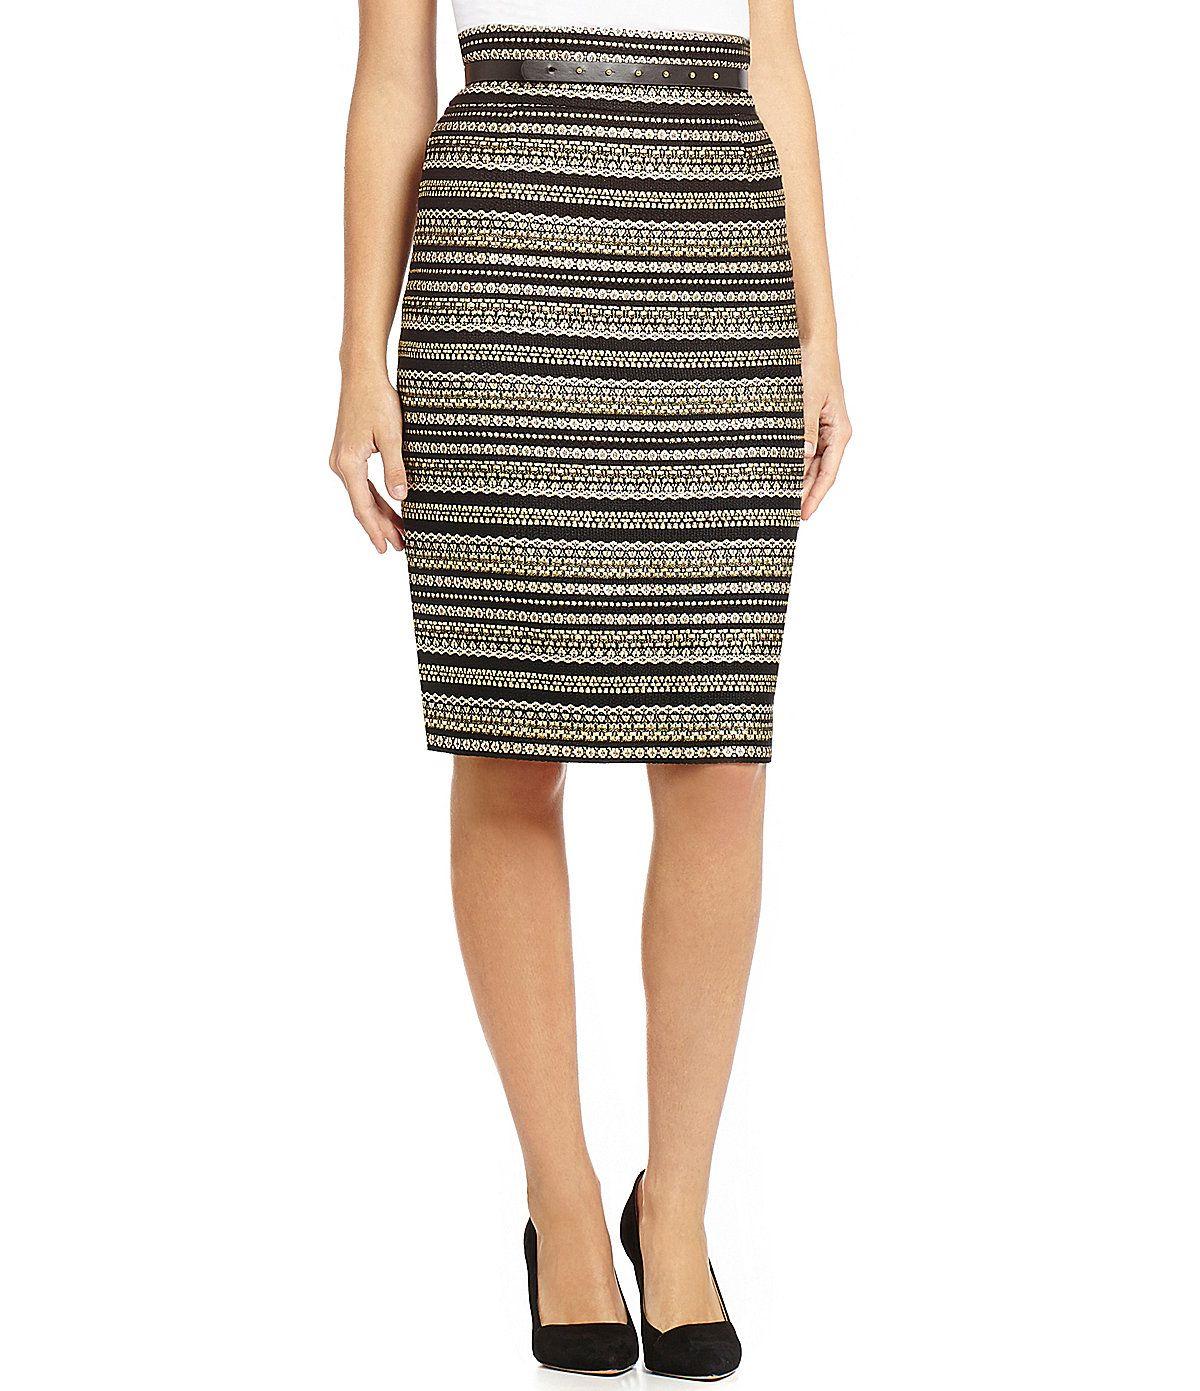 192c41a2147 Antonio Melani Berta Metallic Striped Pencil Skirt Antonio Melani Dress